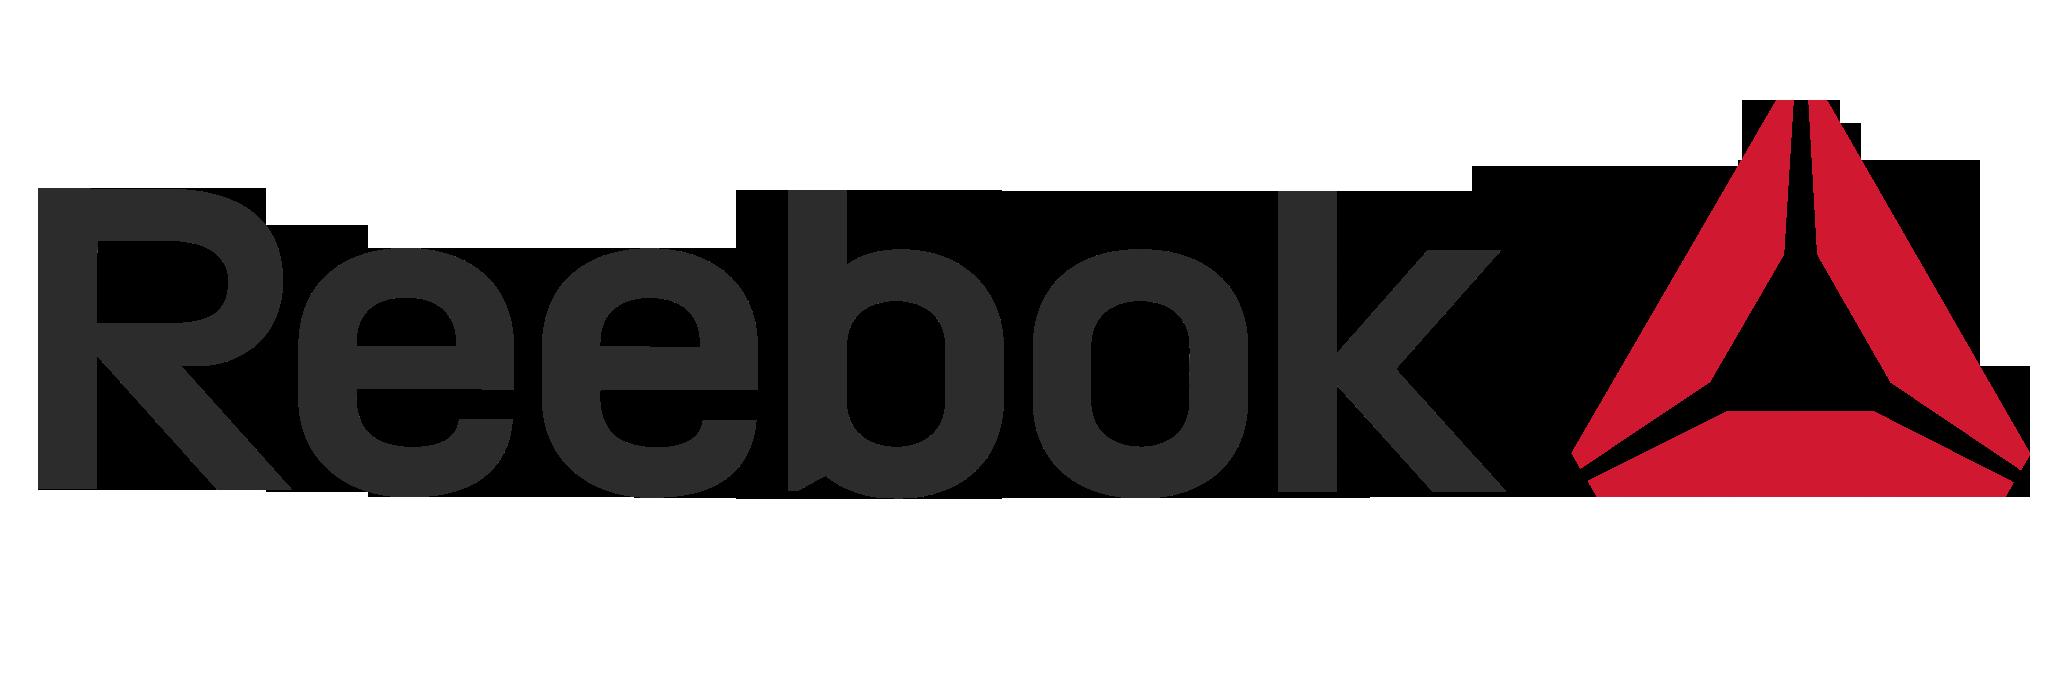 Mbns18 Reebok Logo Microban Partner mtime20190225200949